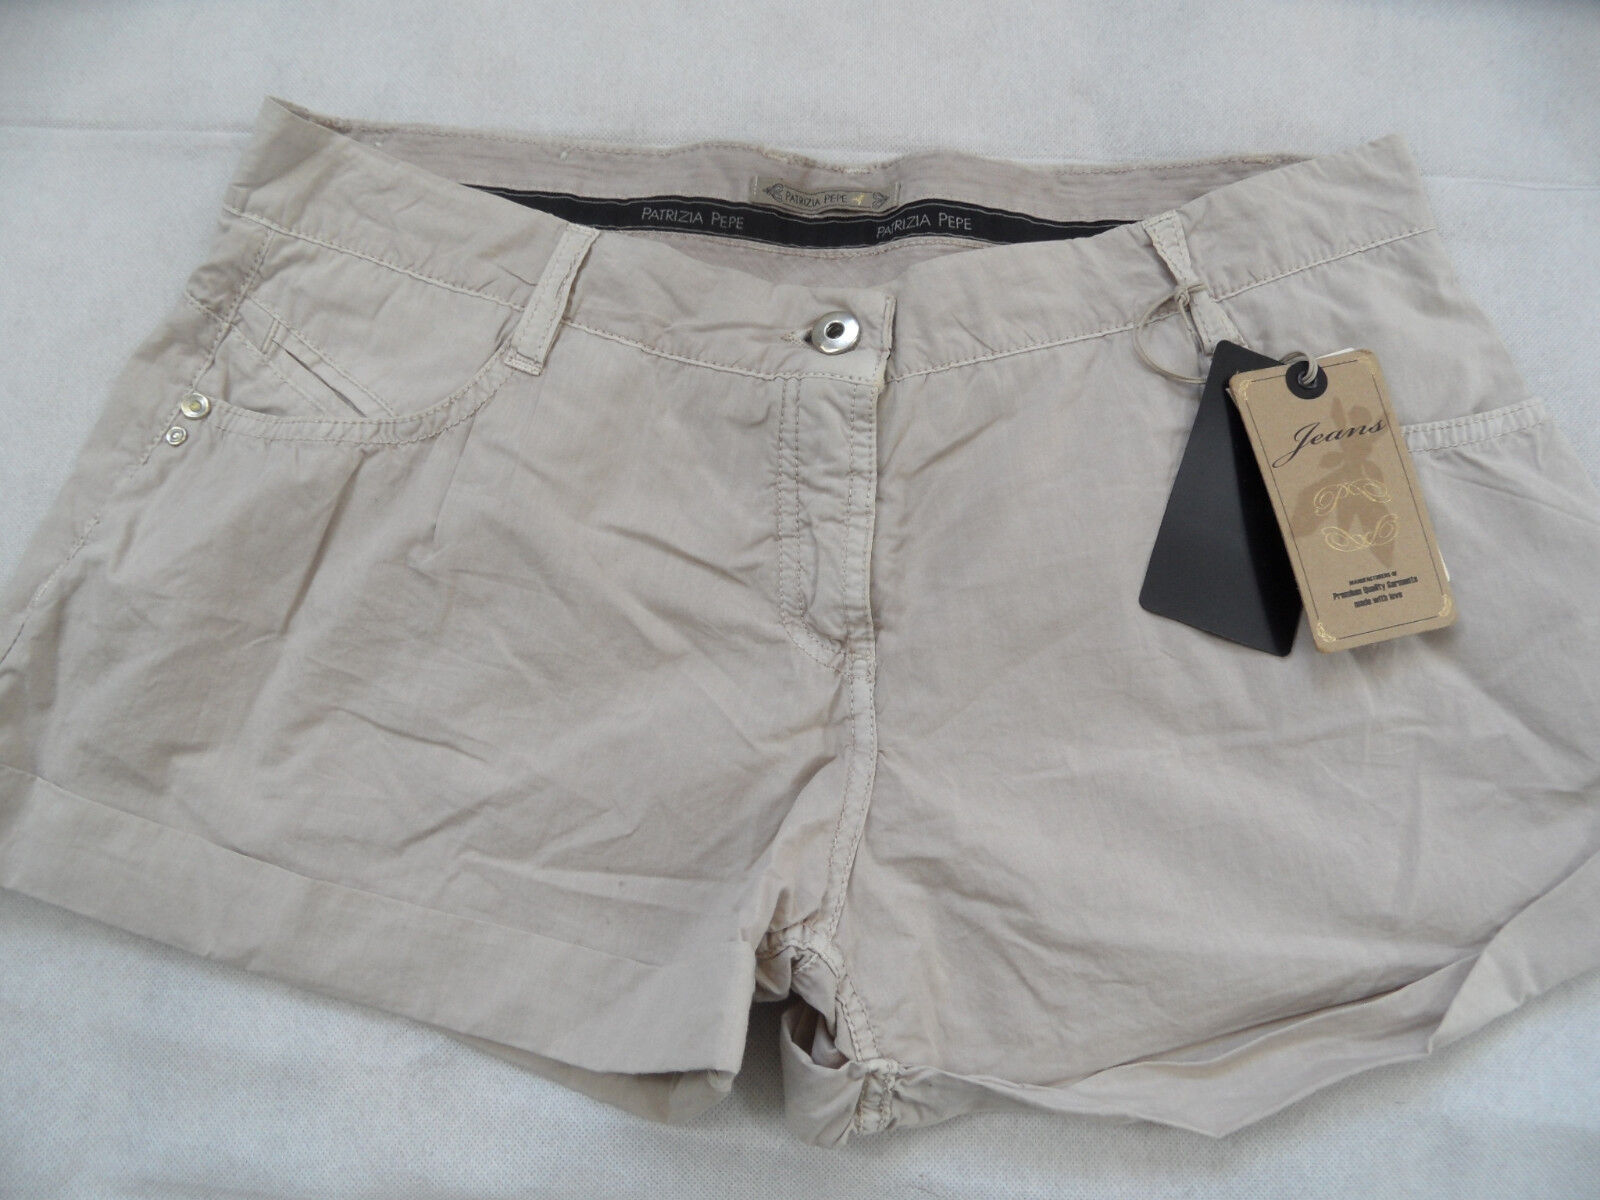 PATRIZIA PEPE schöne leichte Shorts nude Gr. 29 NEU ZC1018